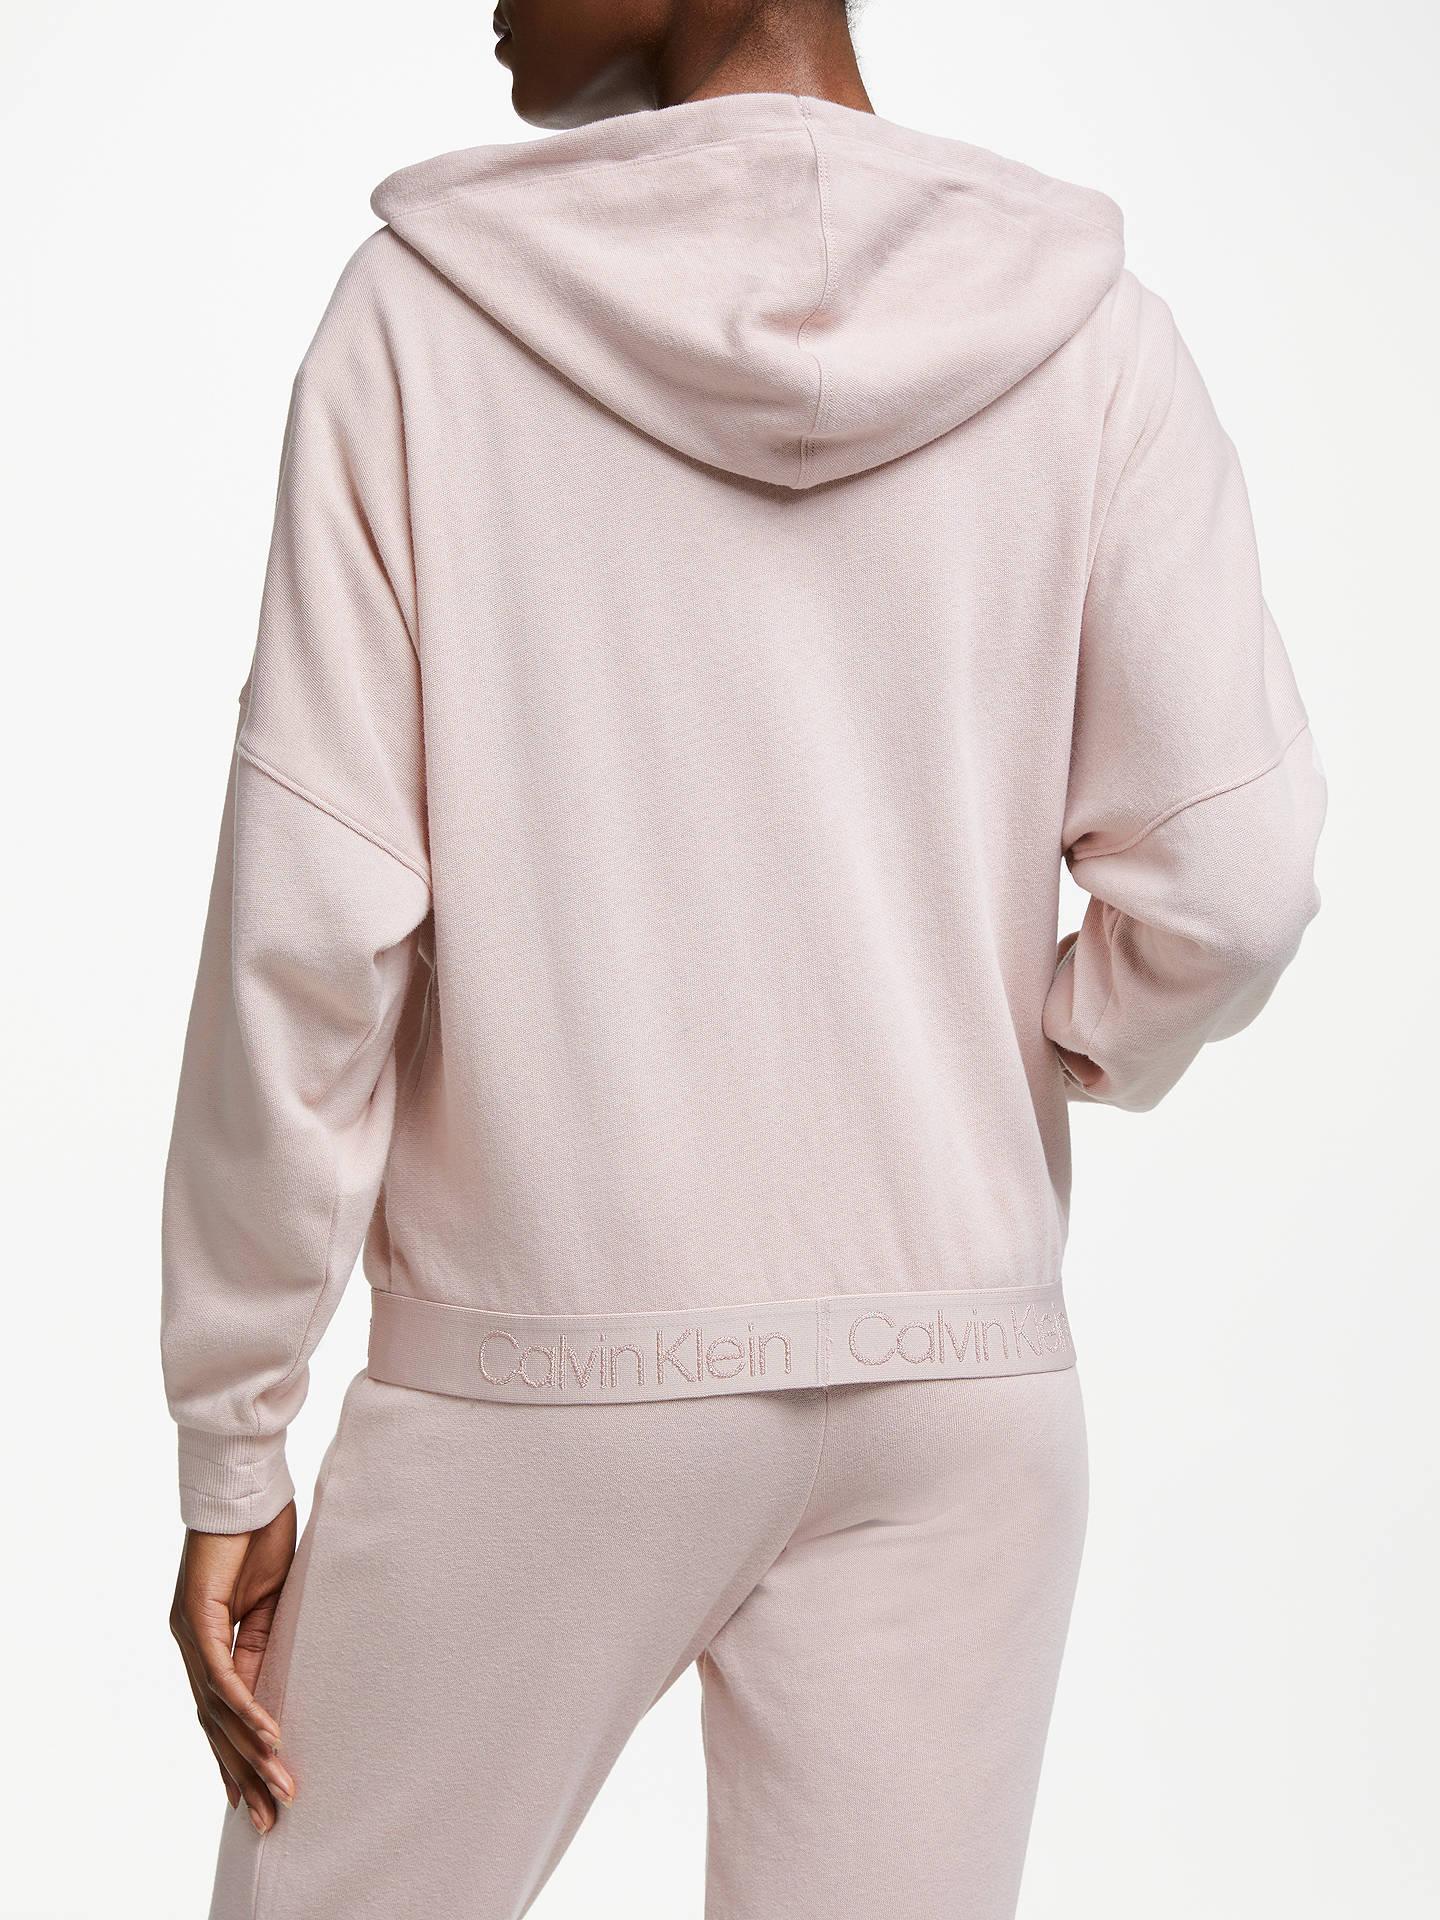 c0a17b6dff Buy Calvin Klein Tonal Logo Zipped Hoodie